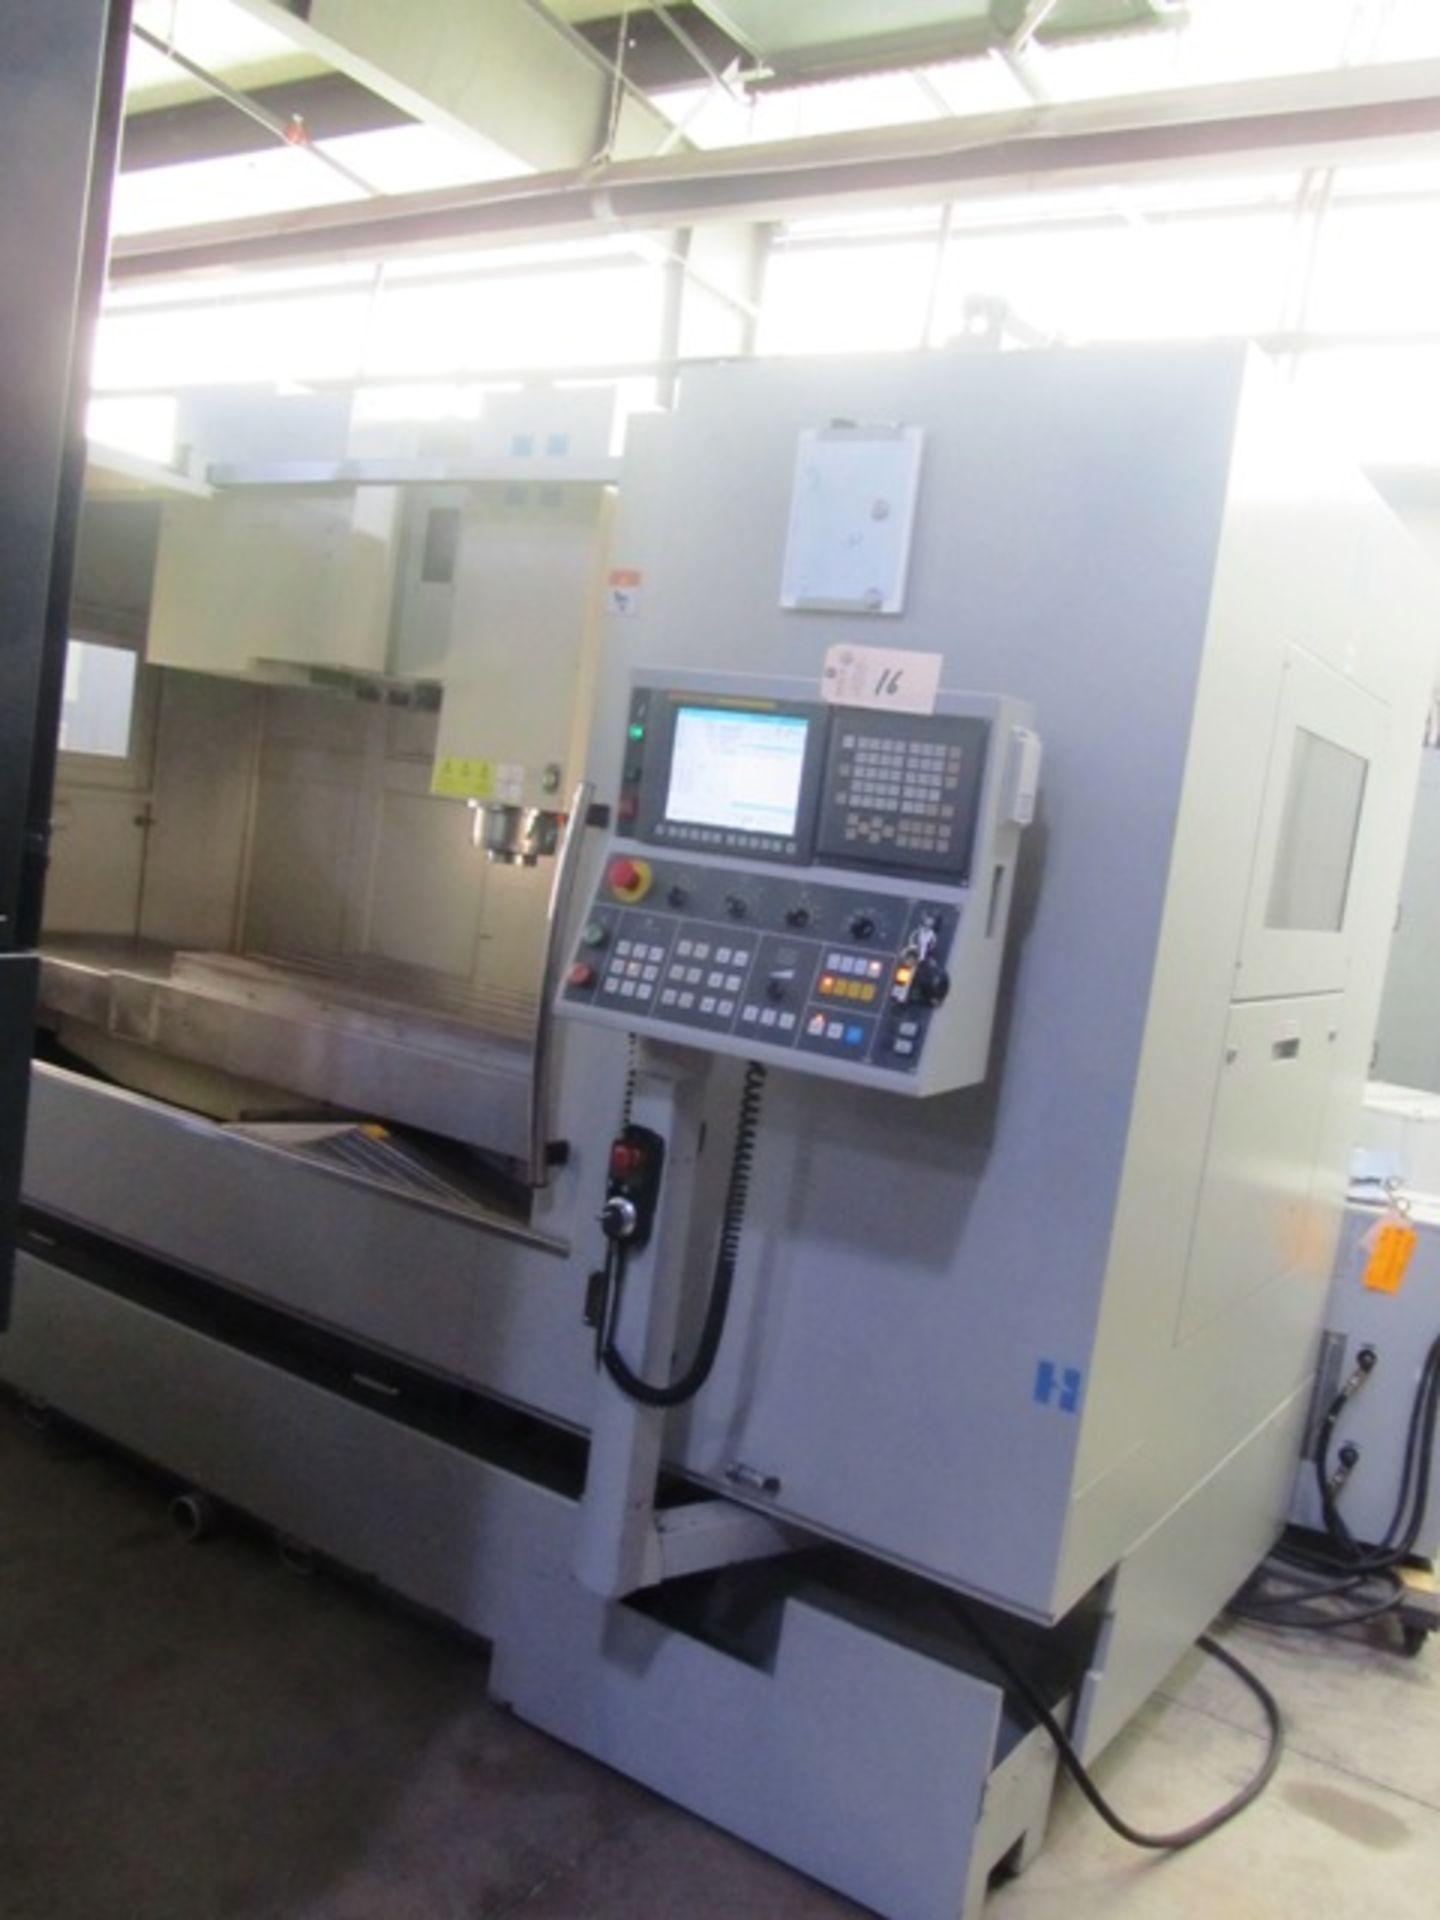 Lot 16 - Bridgeport / Hardinge GX1600 CNC Vertical Machining Center